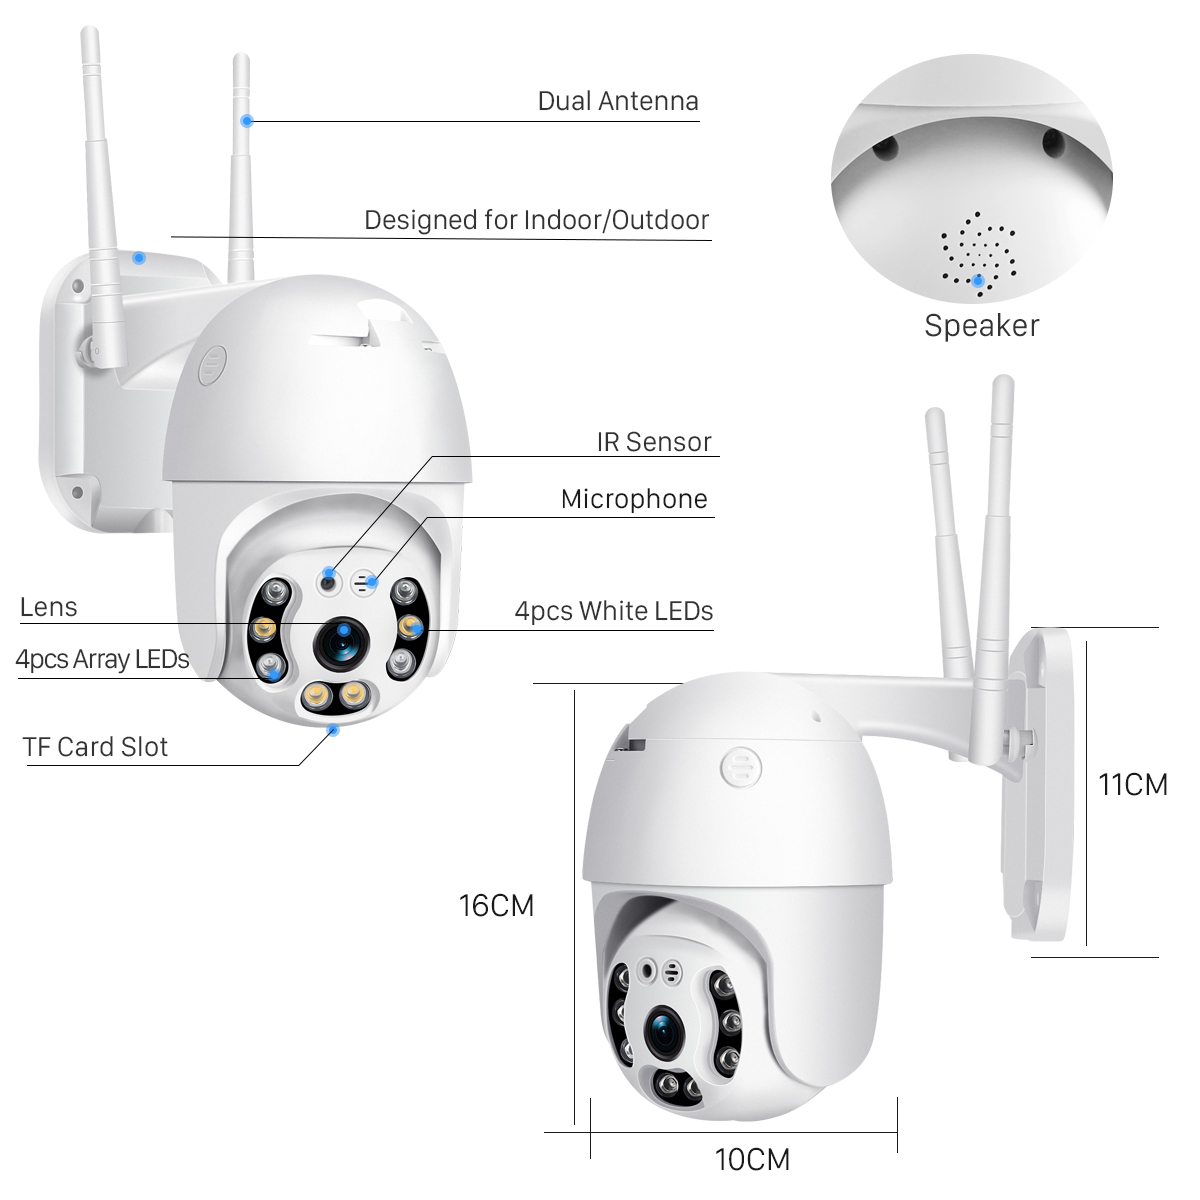 H8dd26333aabf4080b9725e952e9069665 BESDER H.265 PTZ IP Camera 2MP WiFi Cloud Storage Motion Voice Alert Dual Antenna Dual IR Light PTZ Security Surveillance Camera